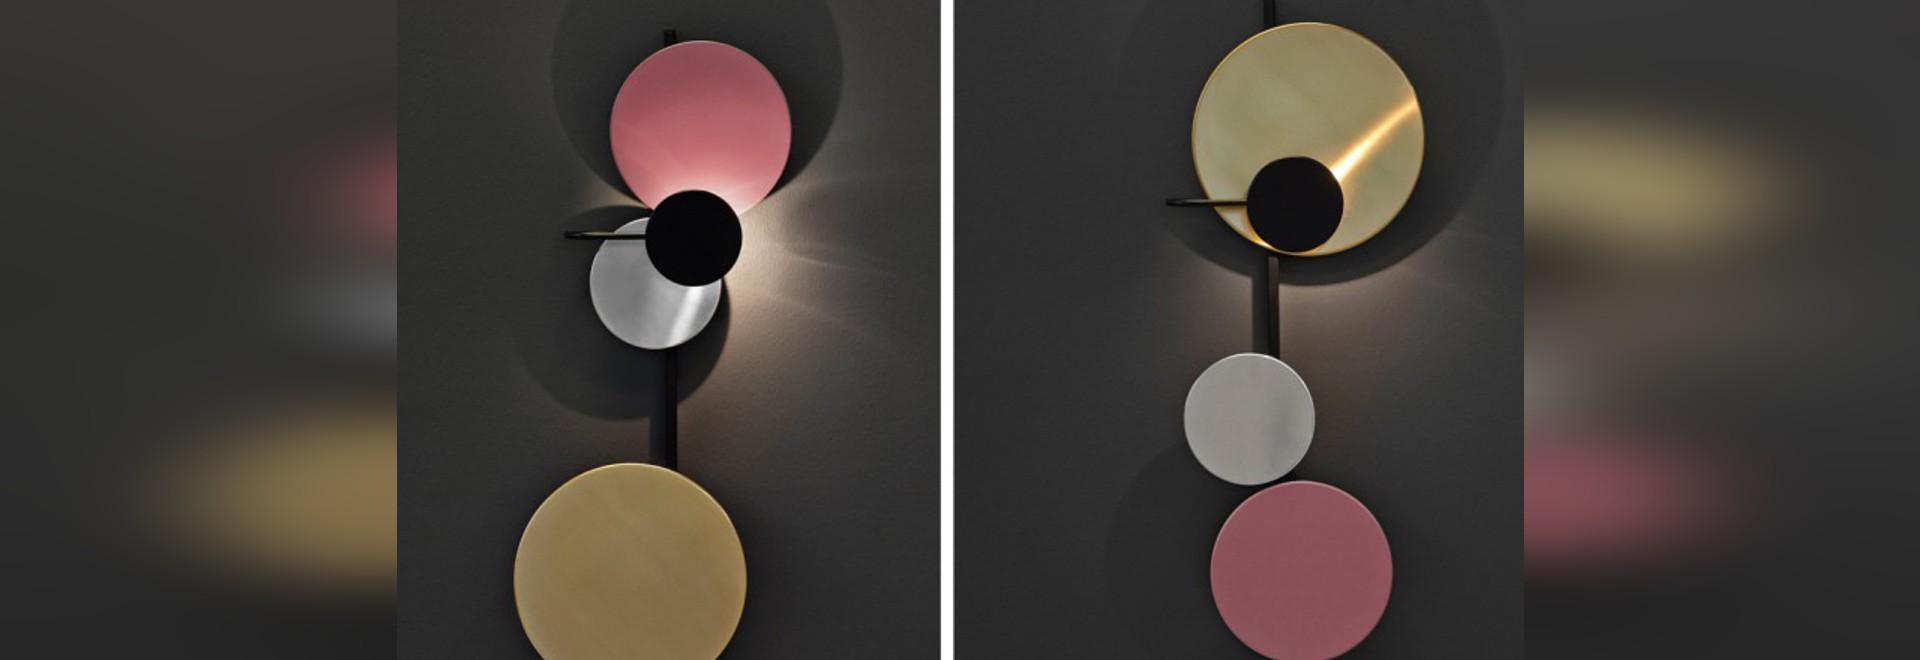 STOCKHOLM 2015: METTE SCHELDEu0027S LAMP IS ITS OWN MAGNETIC SOLAR SYSTEM